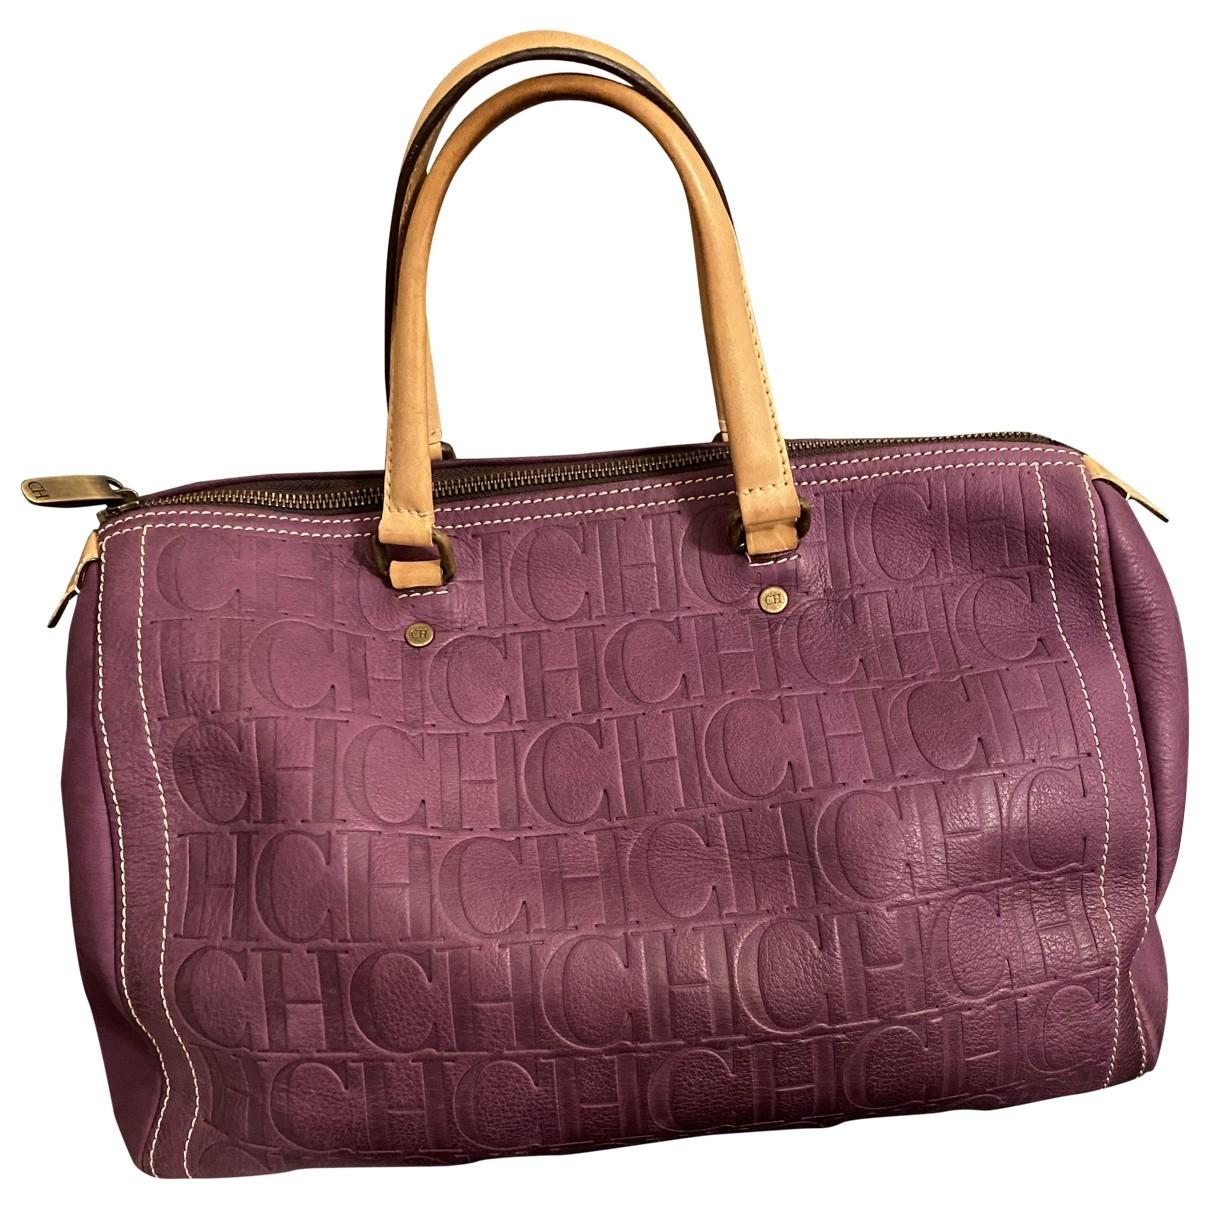 Carolina Herrera - Sac a main   pour femme en cuir - violet